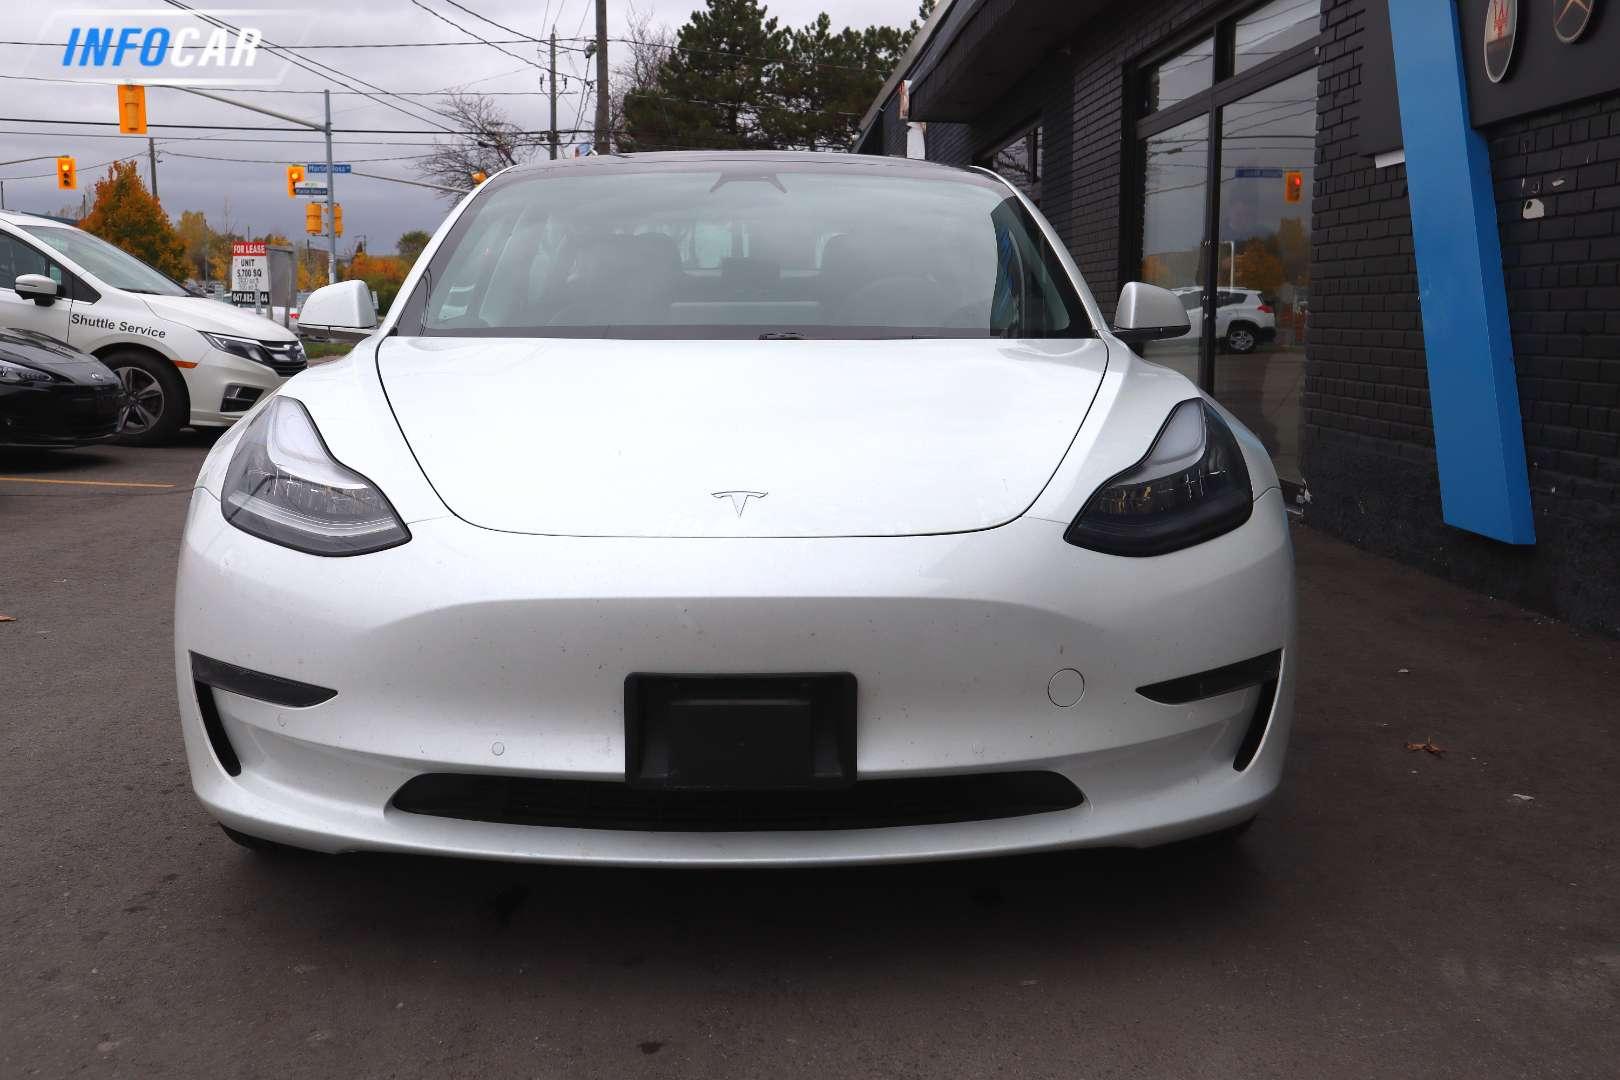 2020 Tesla Model 3 STANDARD RANGE PLUS - INFOCAR - Toronto's Most Comprehensive New and Used Auto Trading Platform